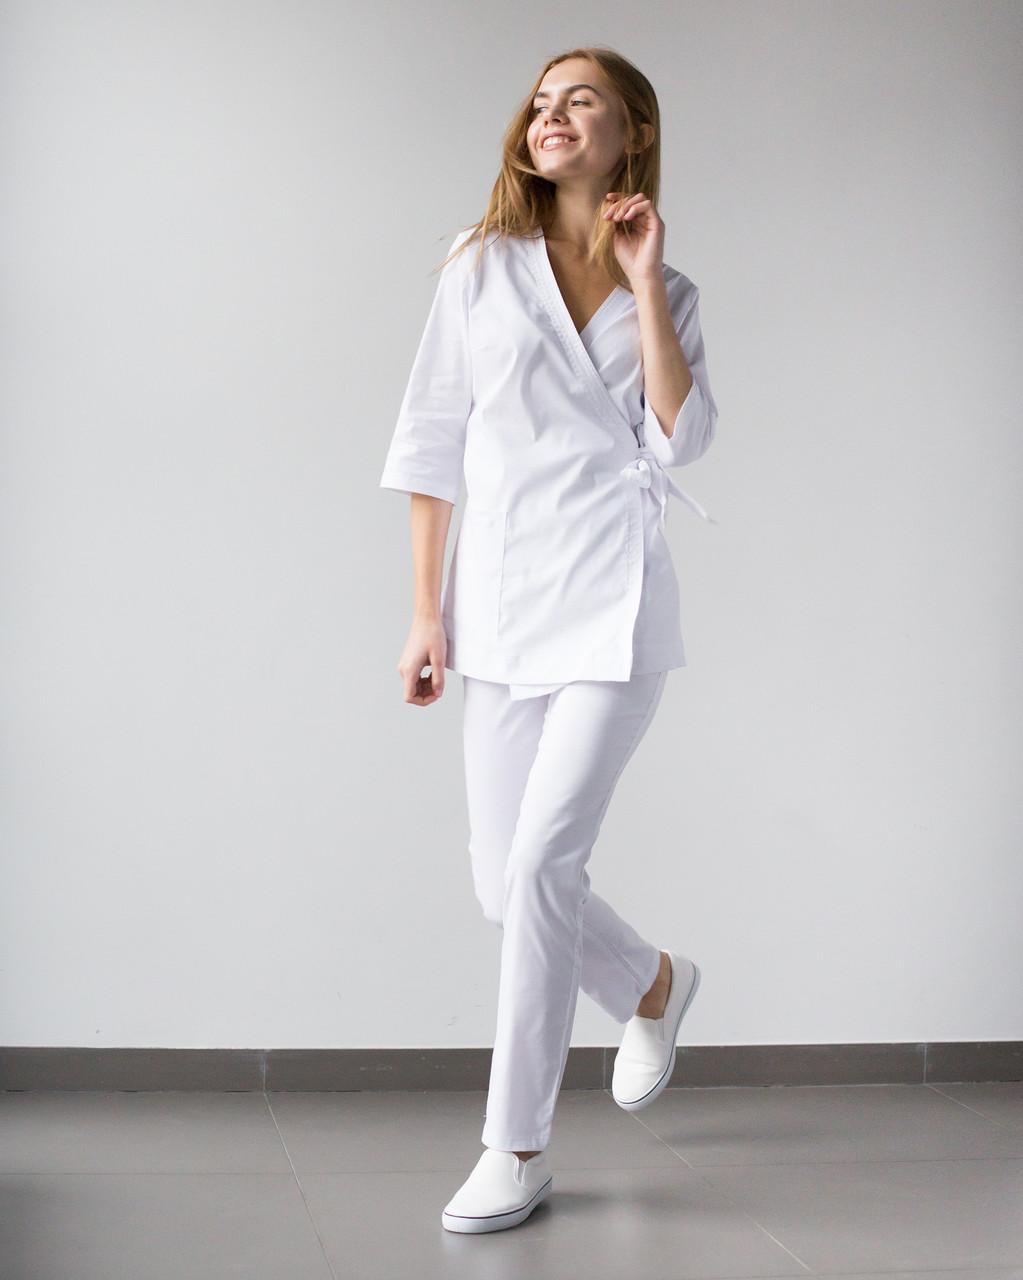 Медицинский женский костюм Шанхай белый